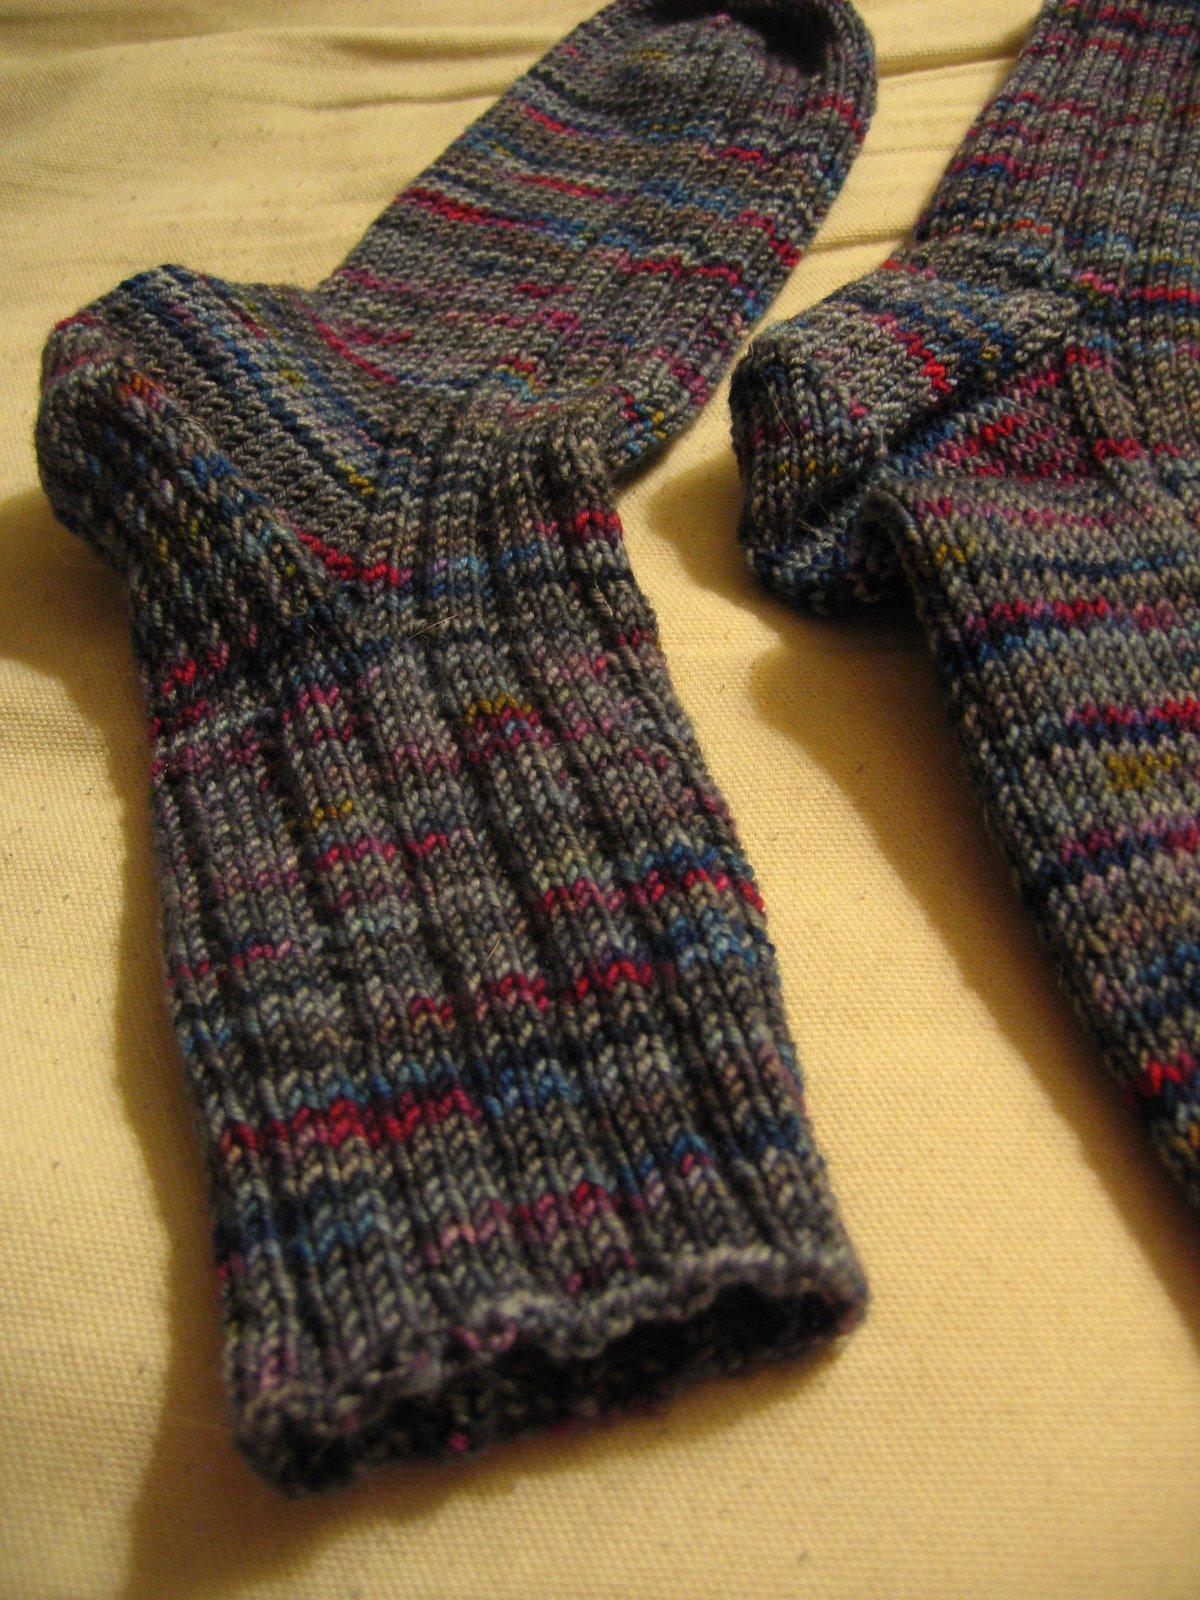 [Slate+Socks:+Closeup]